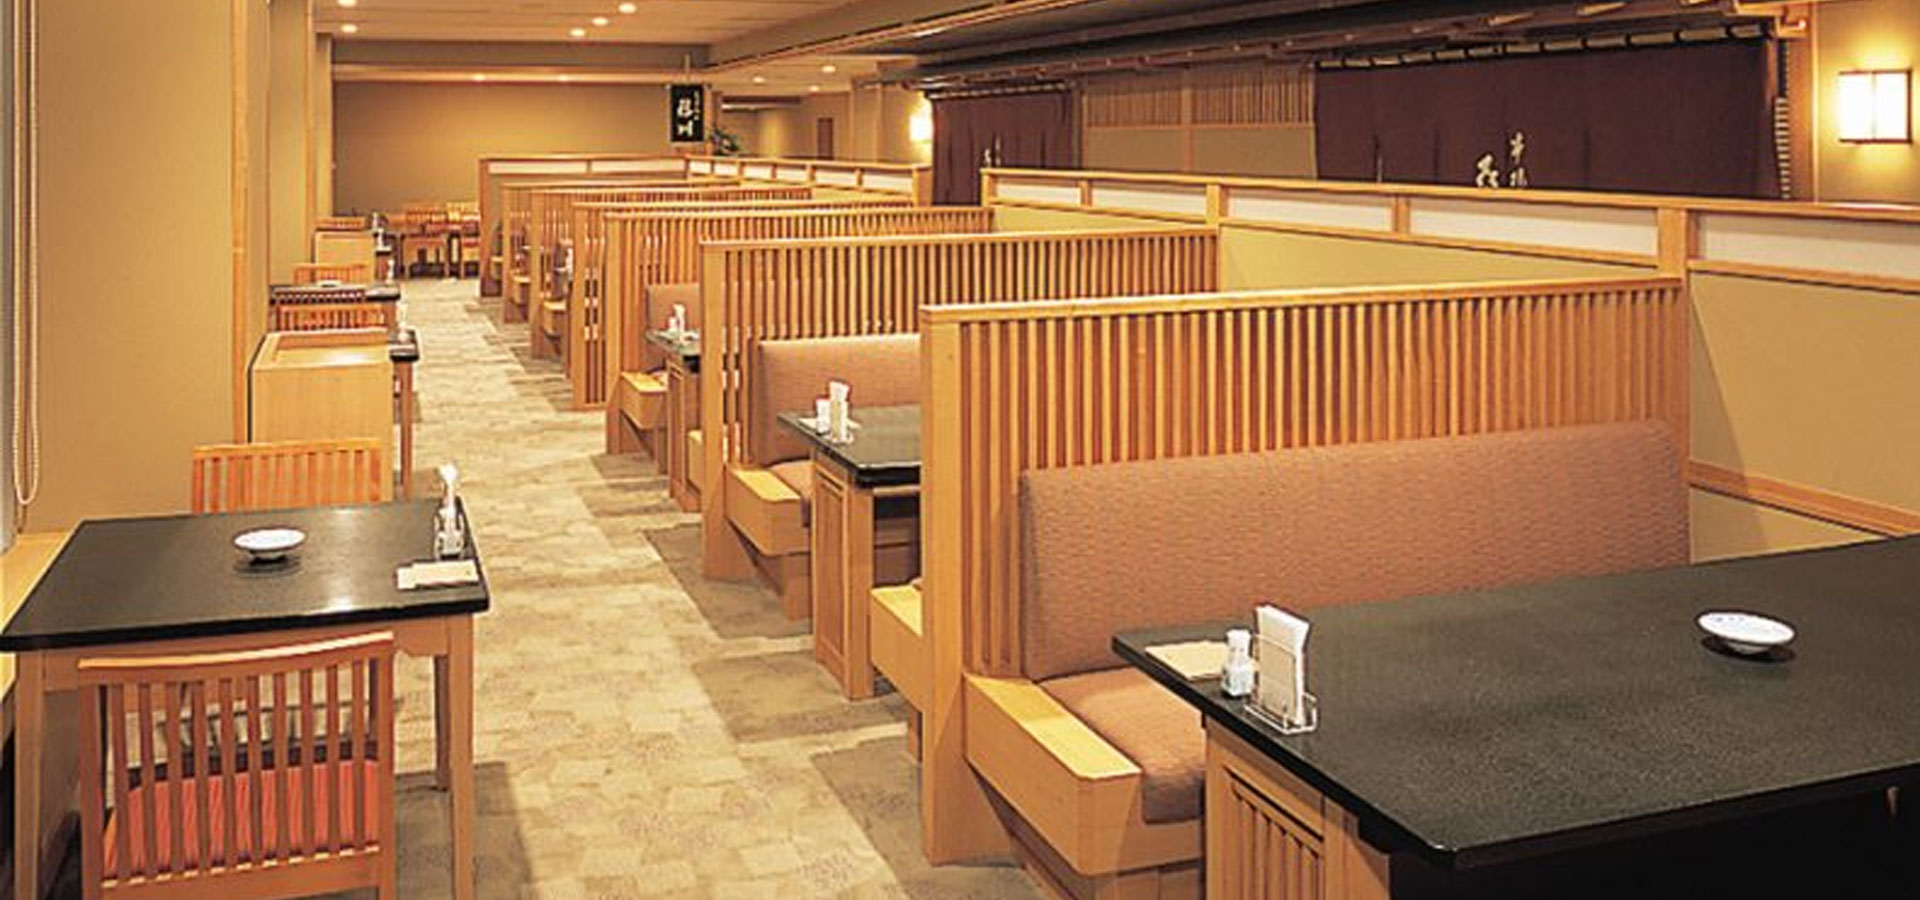 Japanese Restaurant Ajikaido Gojusantsugi